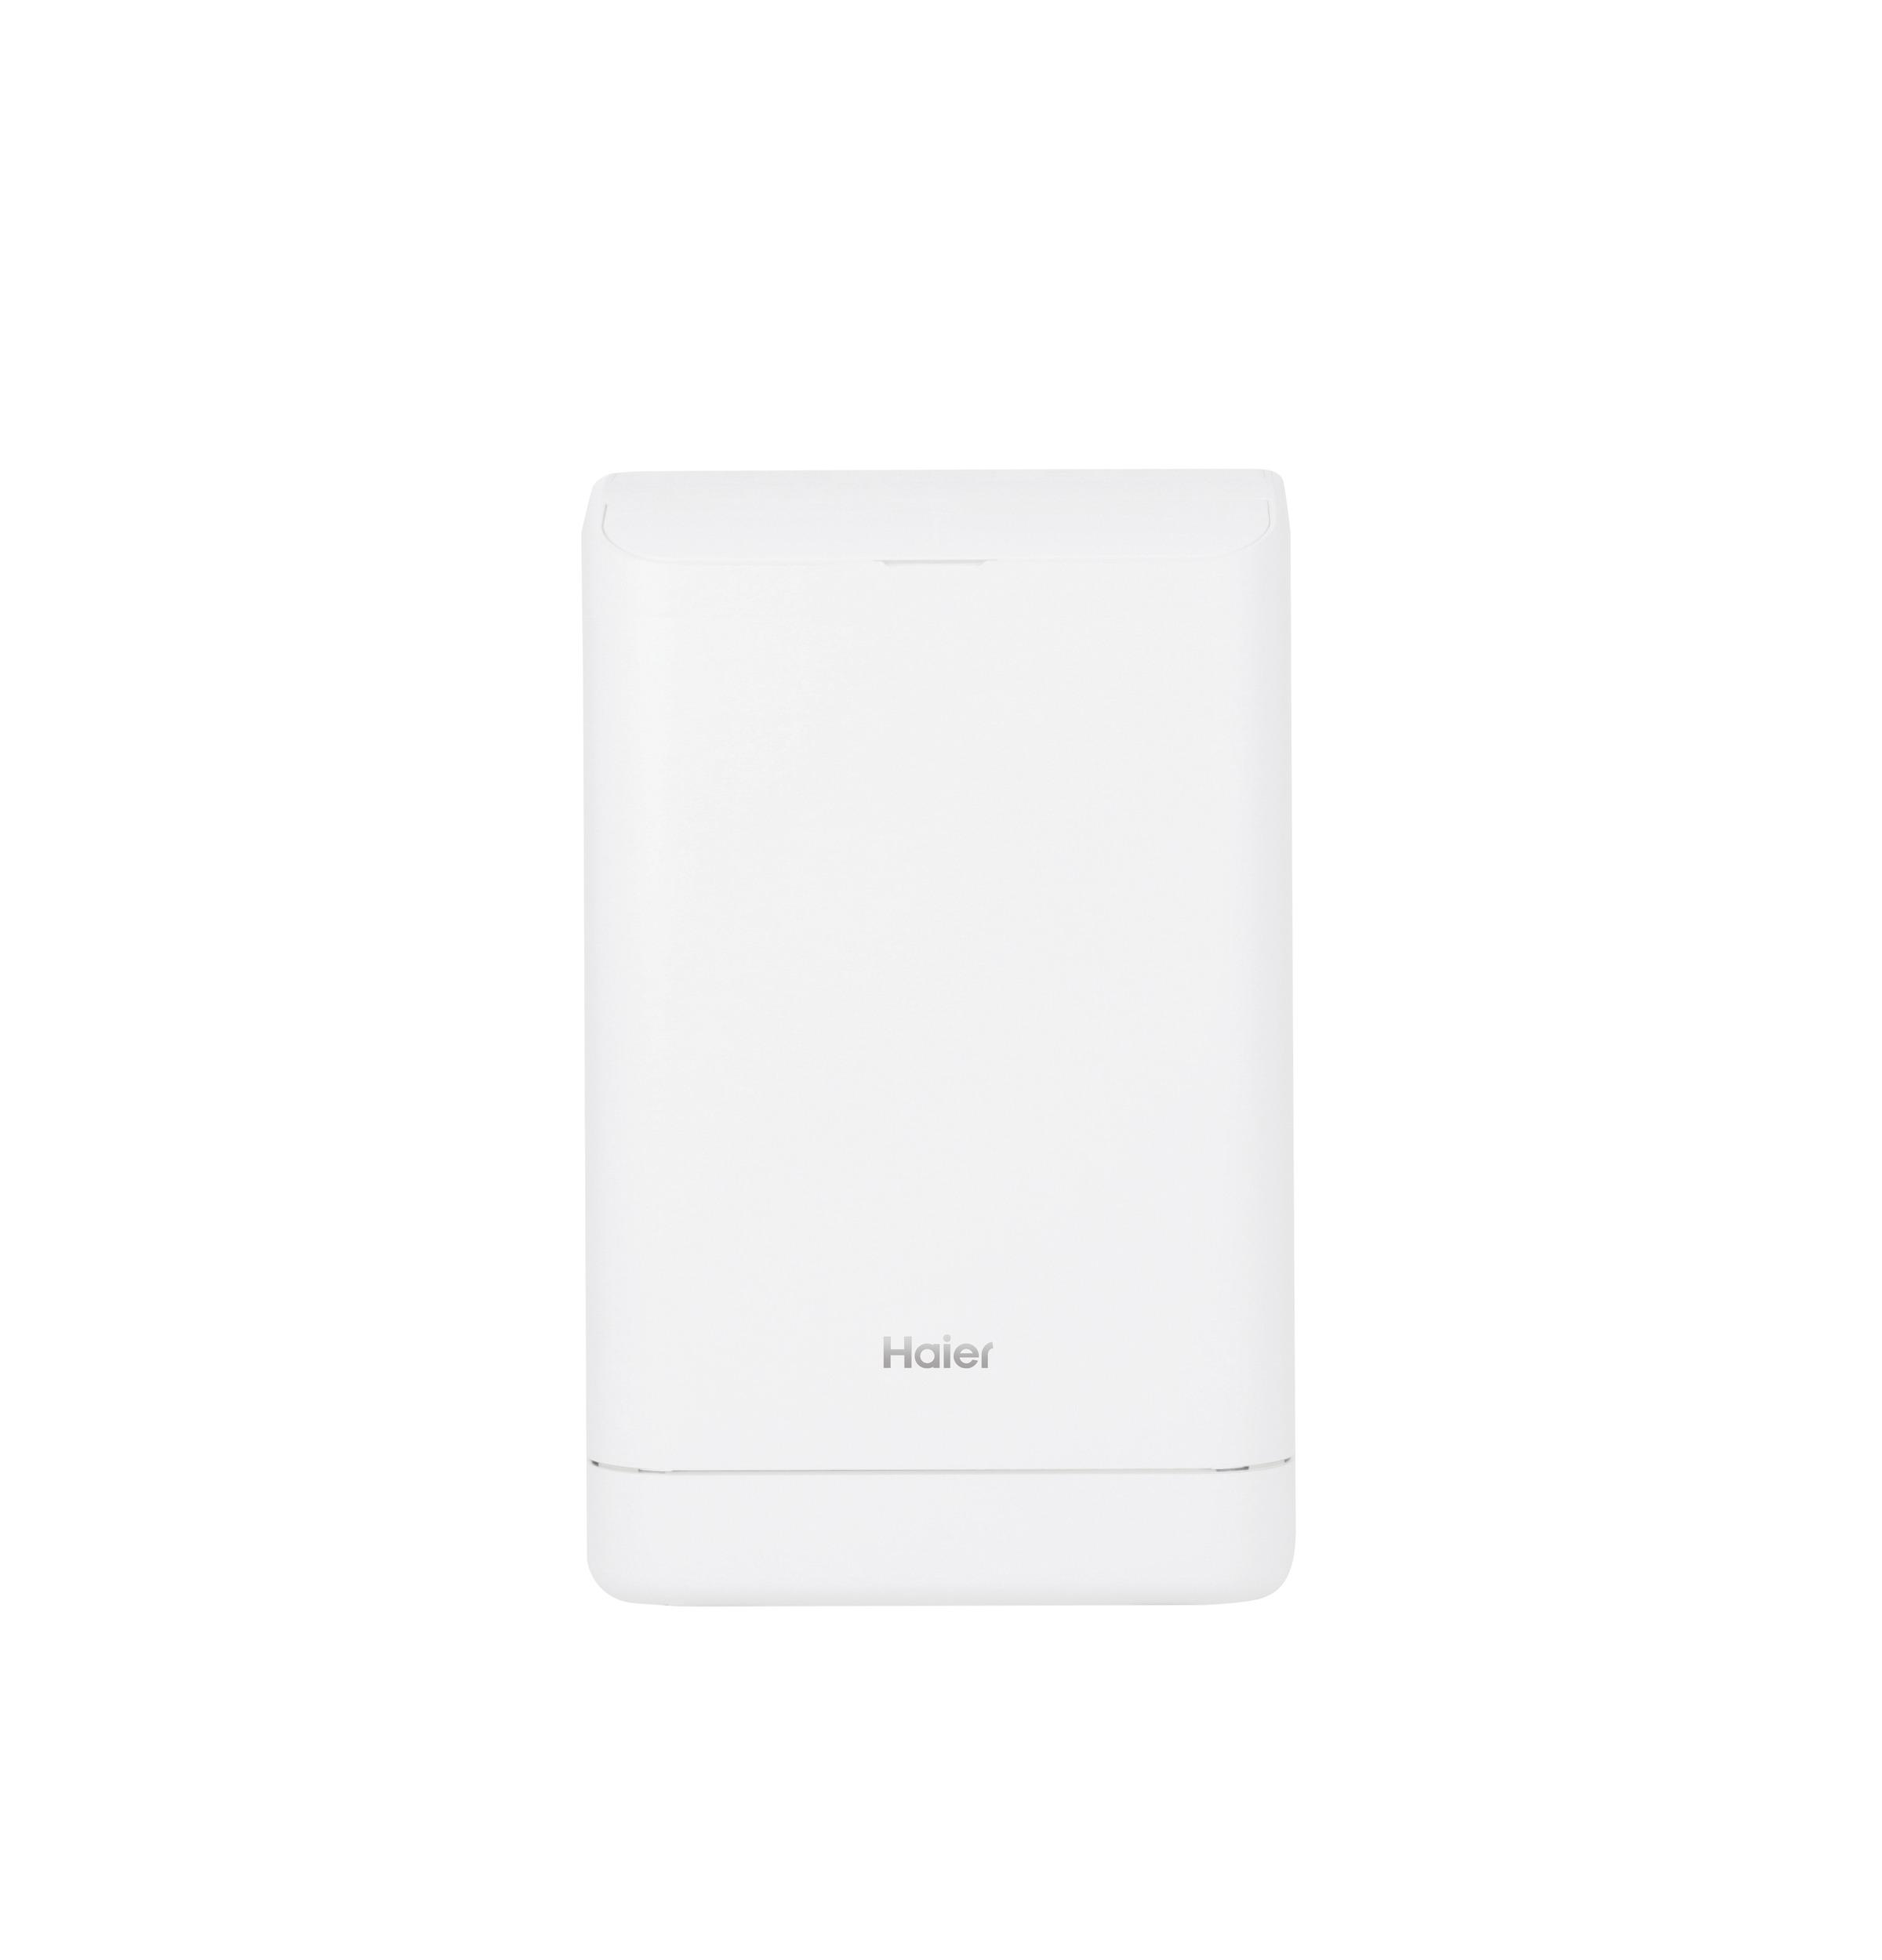 Haier Haier® Portable Air Conditioner with Dehumidifier for Medium Rooms up to 350 sq. ft., 10,000 BTU (6,700 BTU SACC)